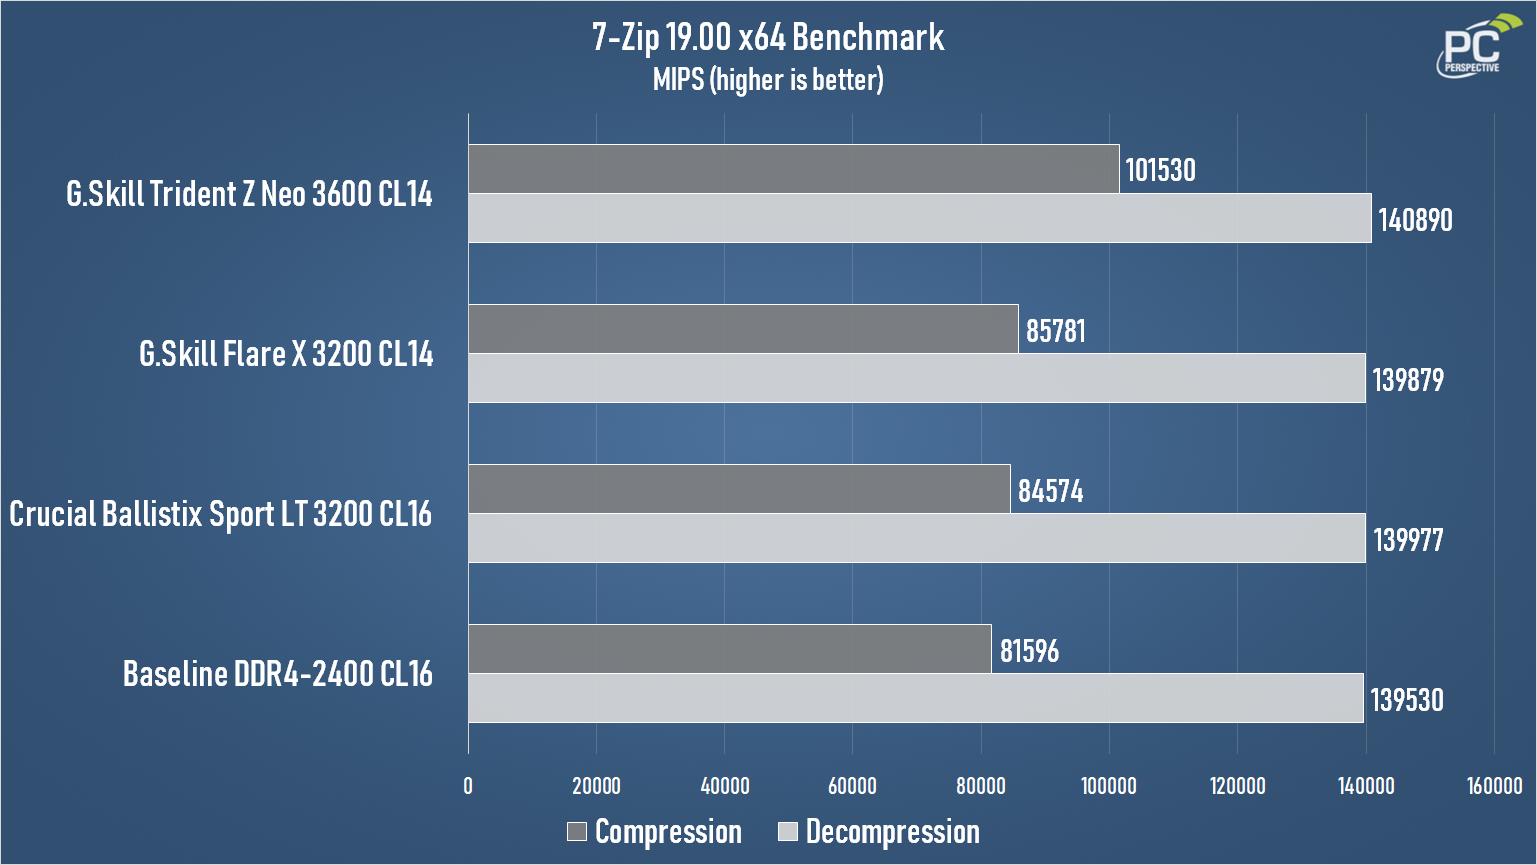 G.Skill Trident Z Neo DDR4-3600 CL14 7z Chart